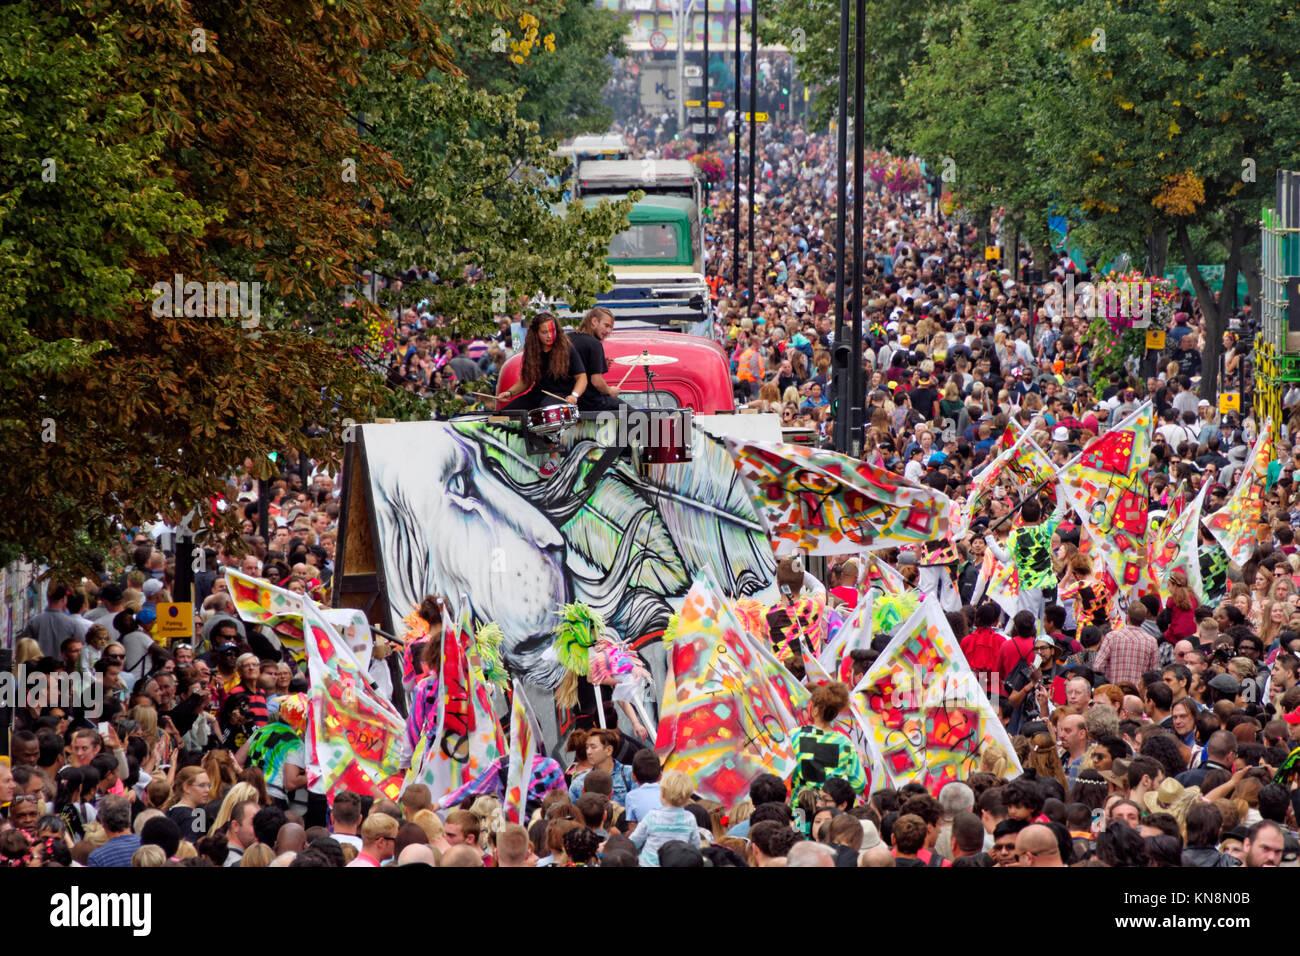 Notting Hill Carnival, London, England - Stock Image